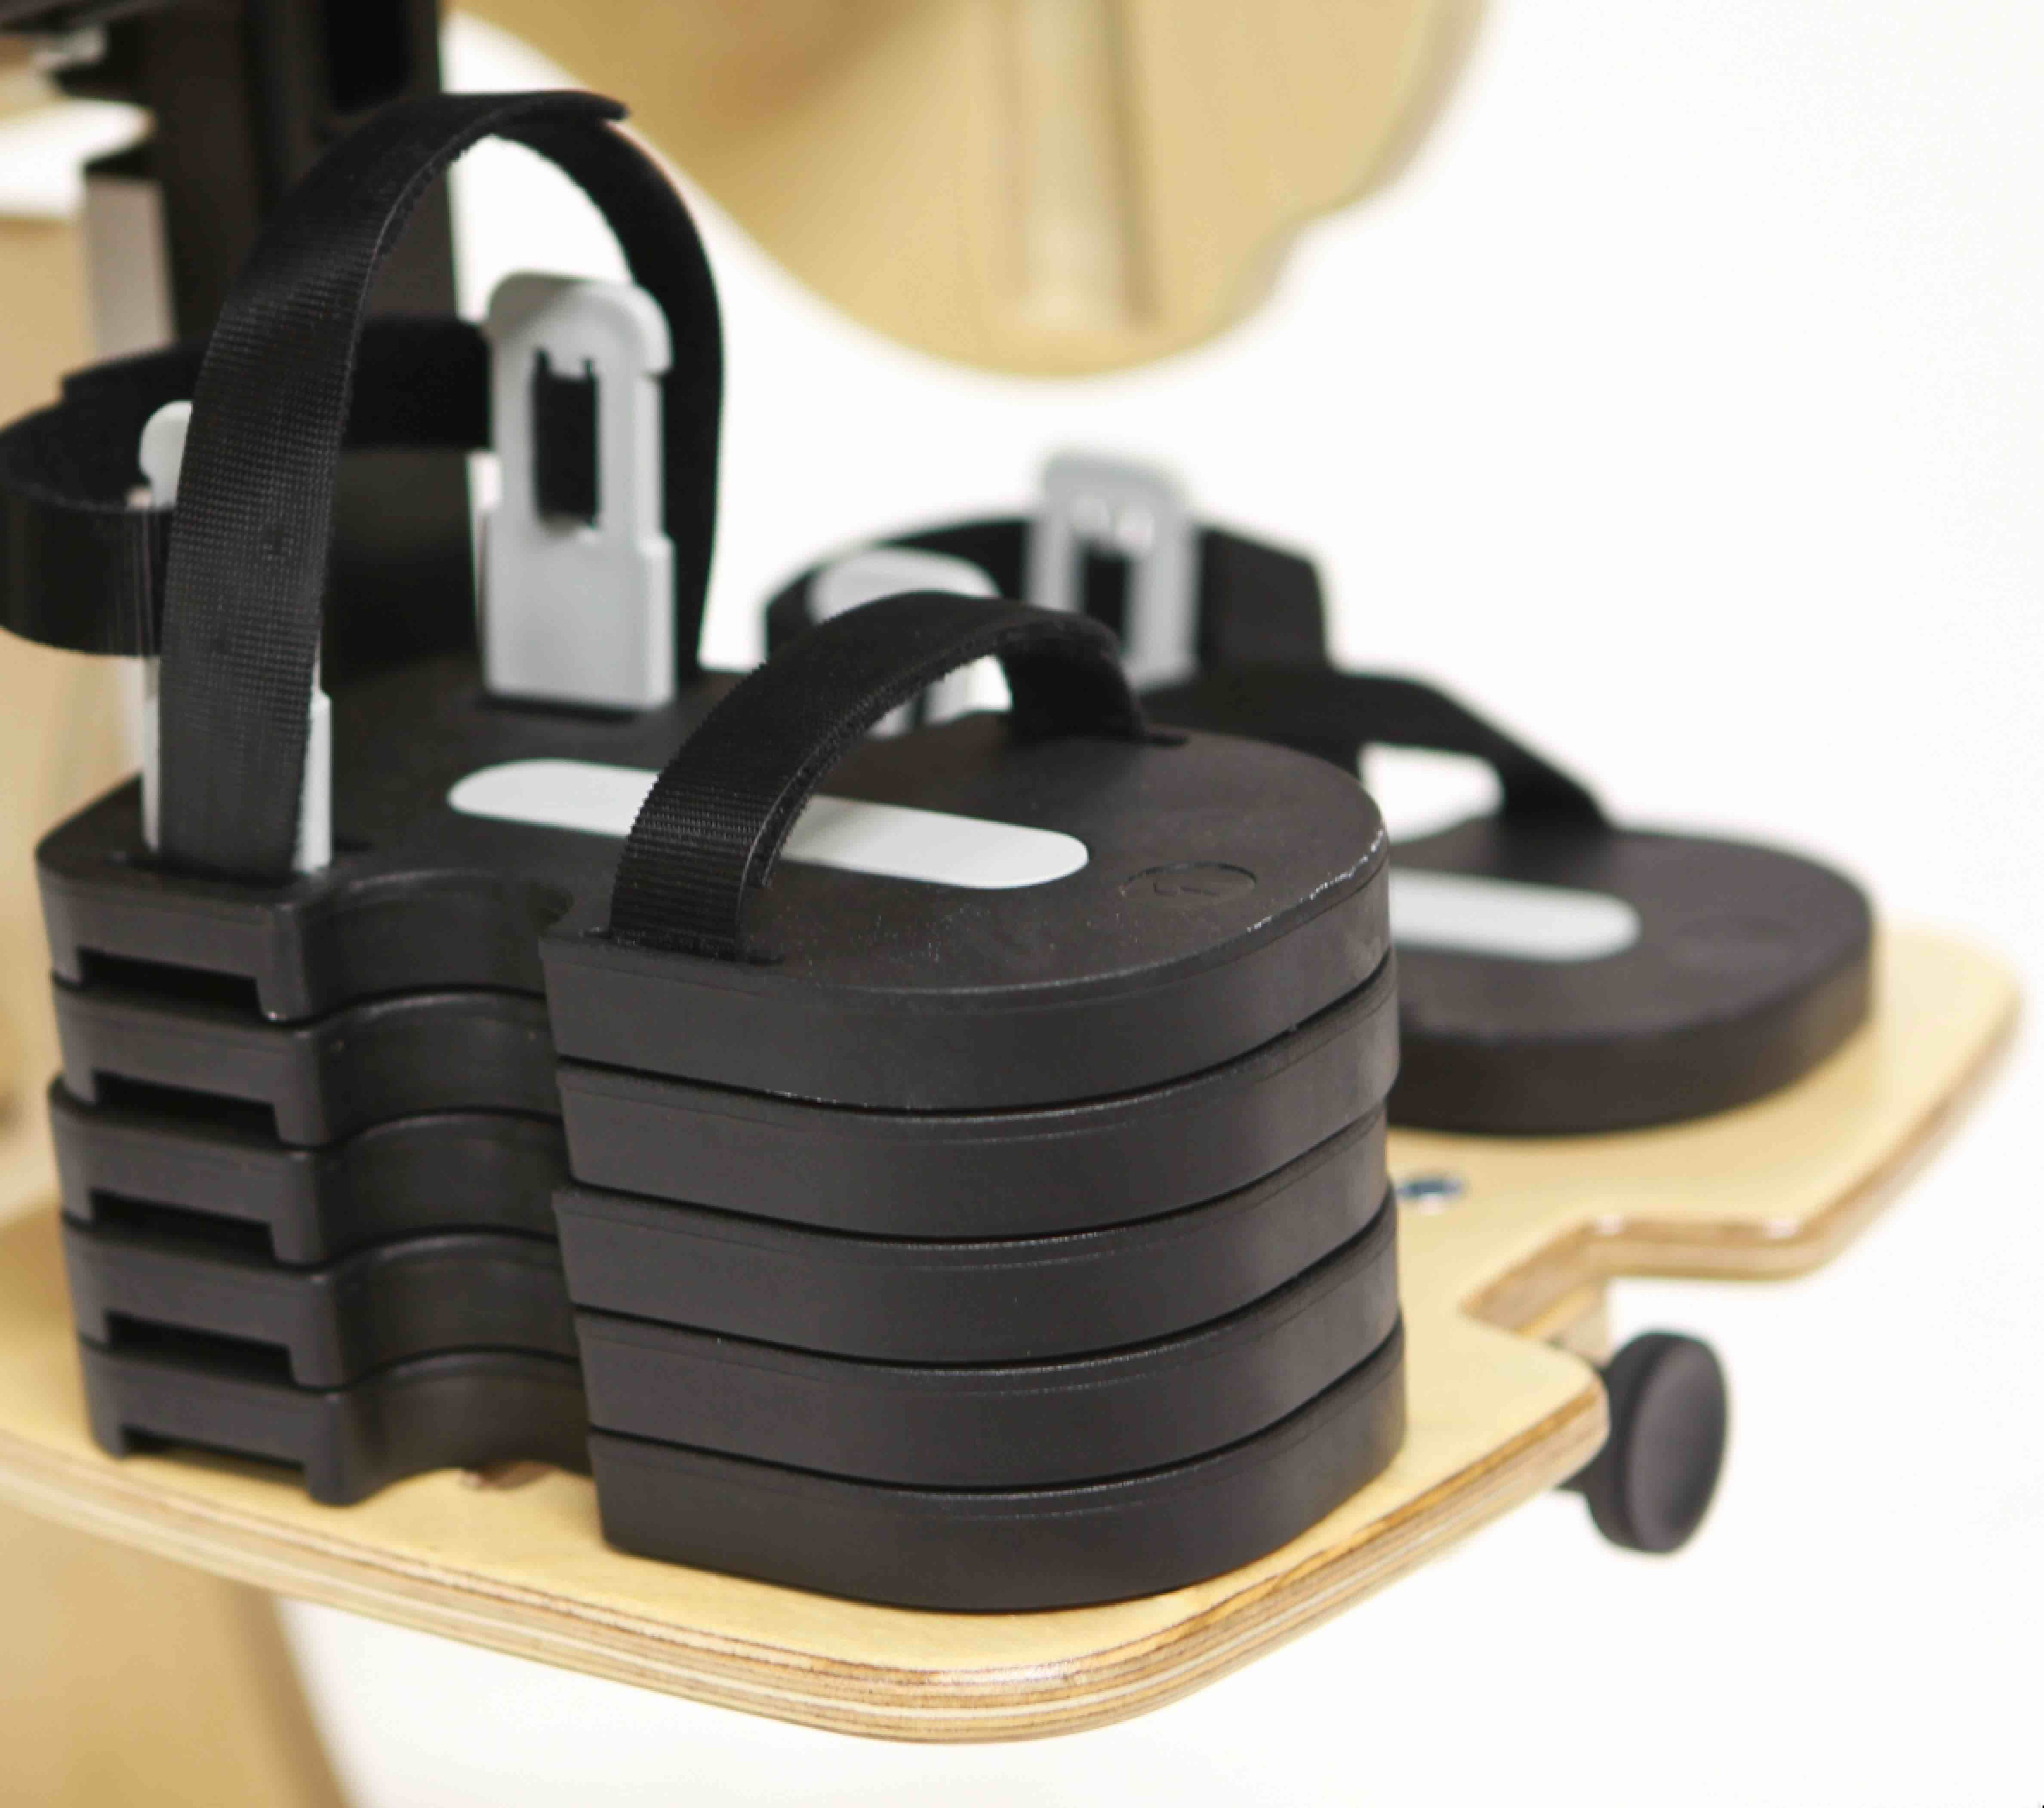 Sandal Raising Blocks For The Jenx Monkey Pediatric Prone